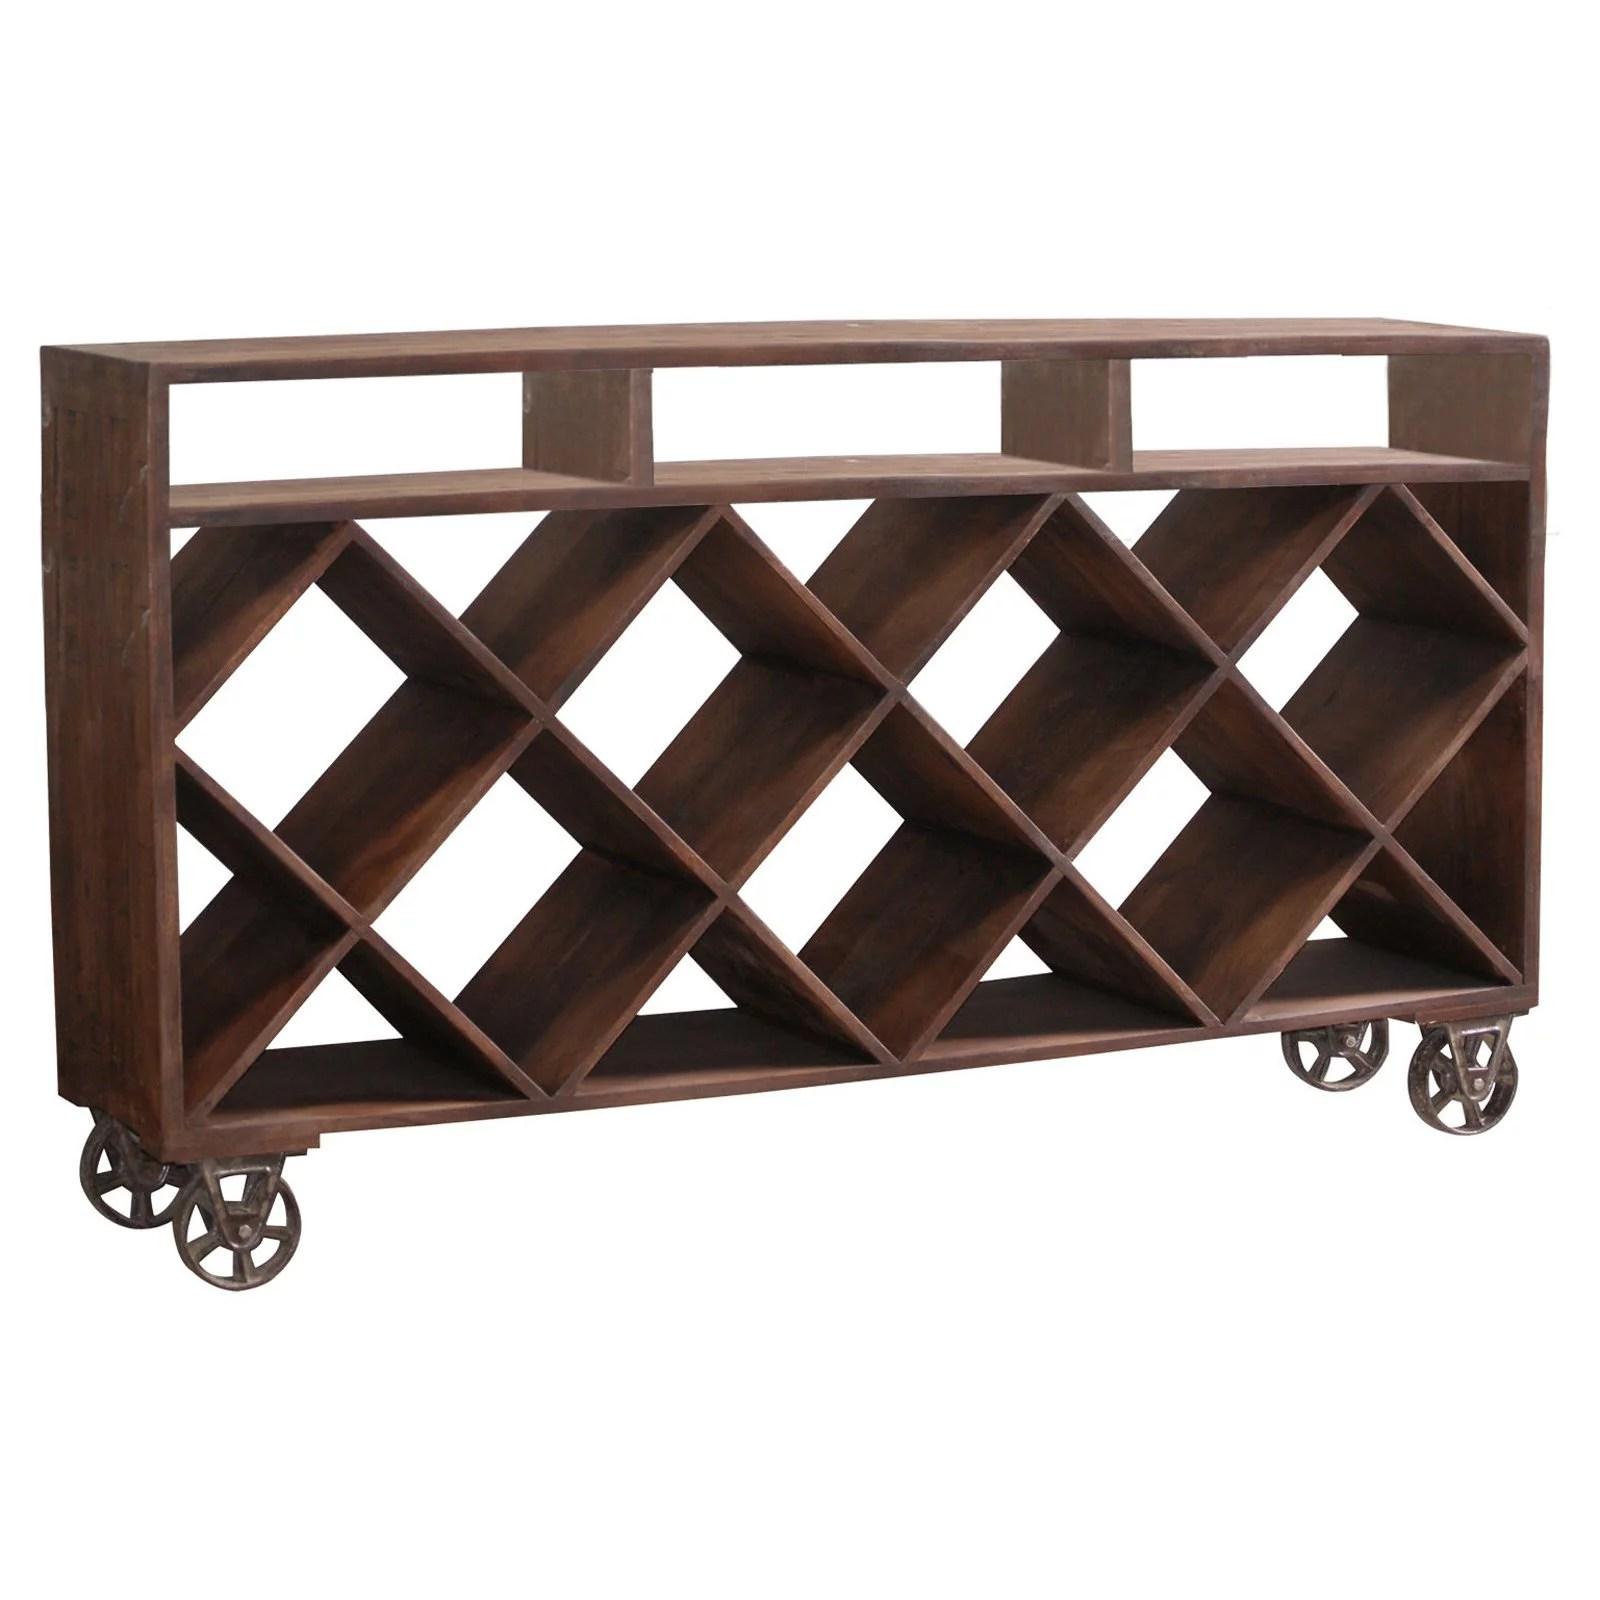 stein world ruthe wine rack display table on wheels